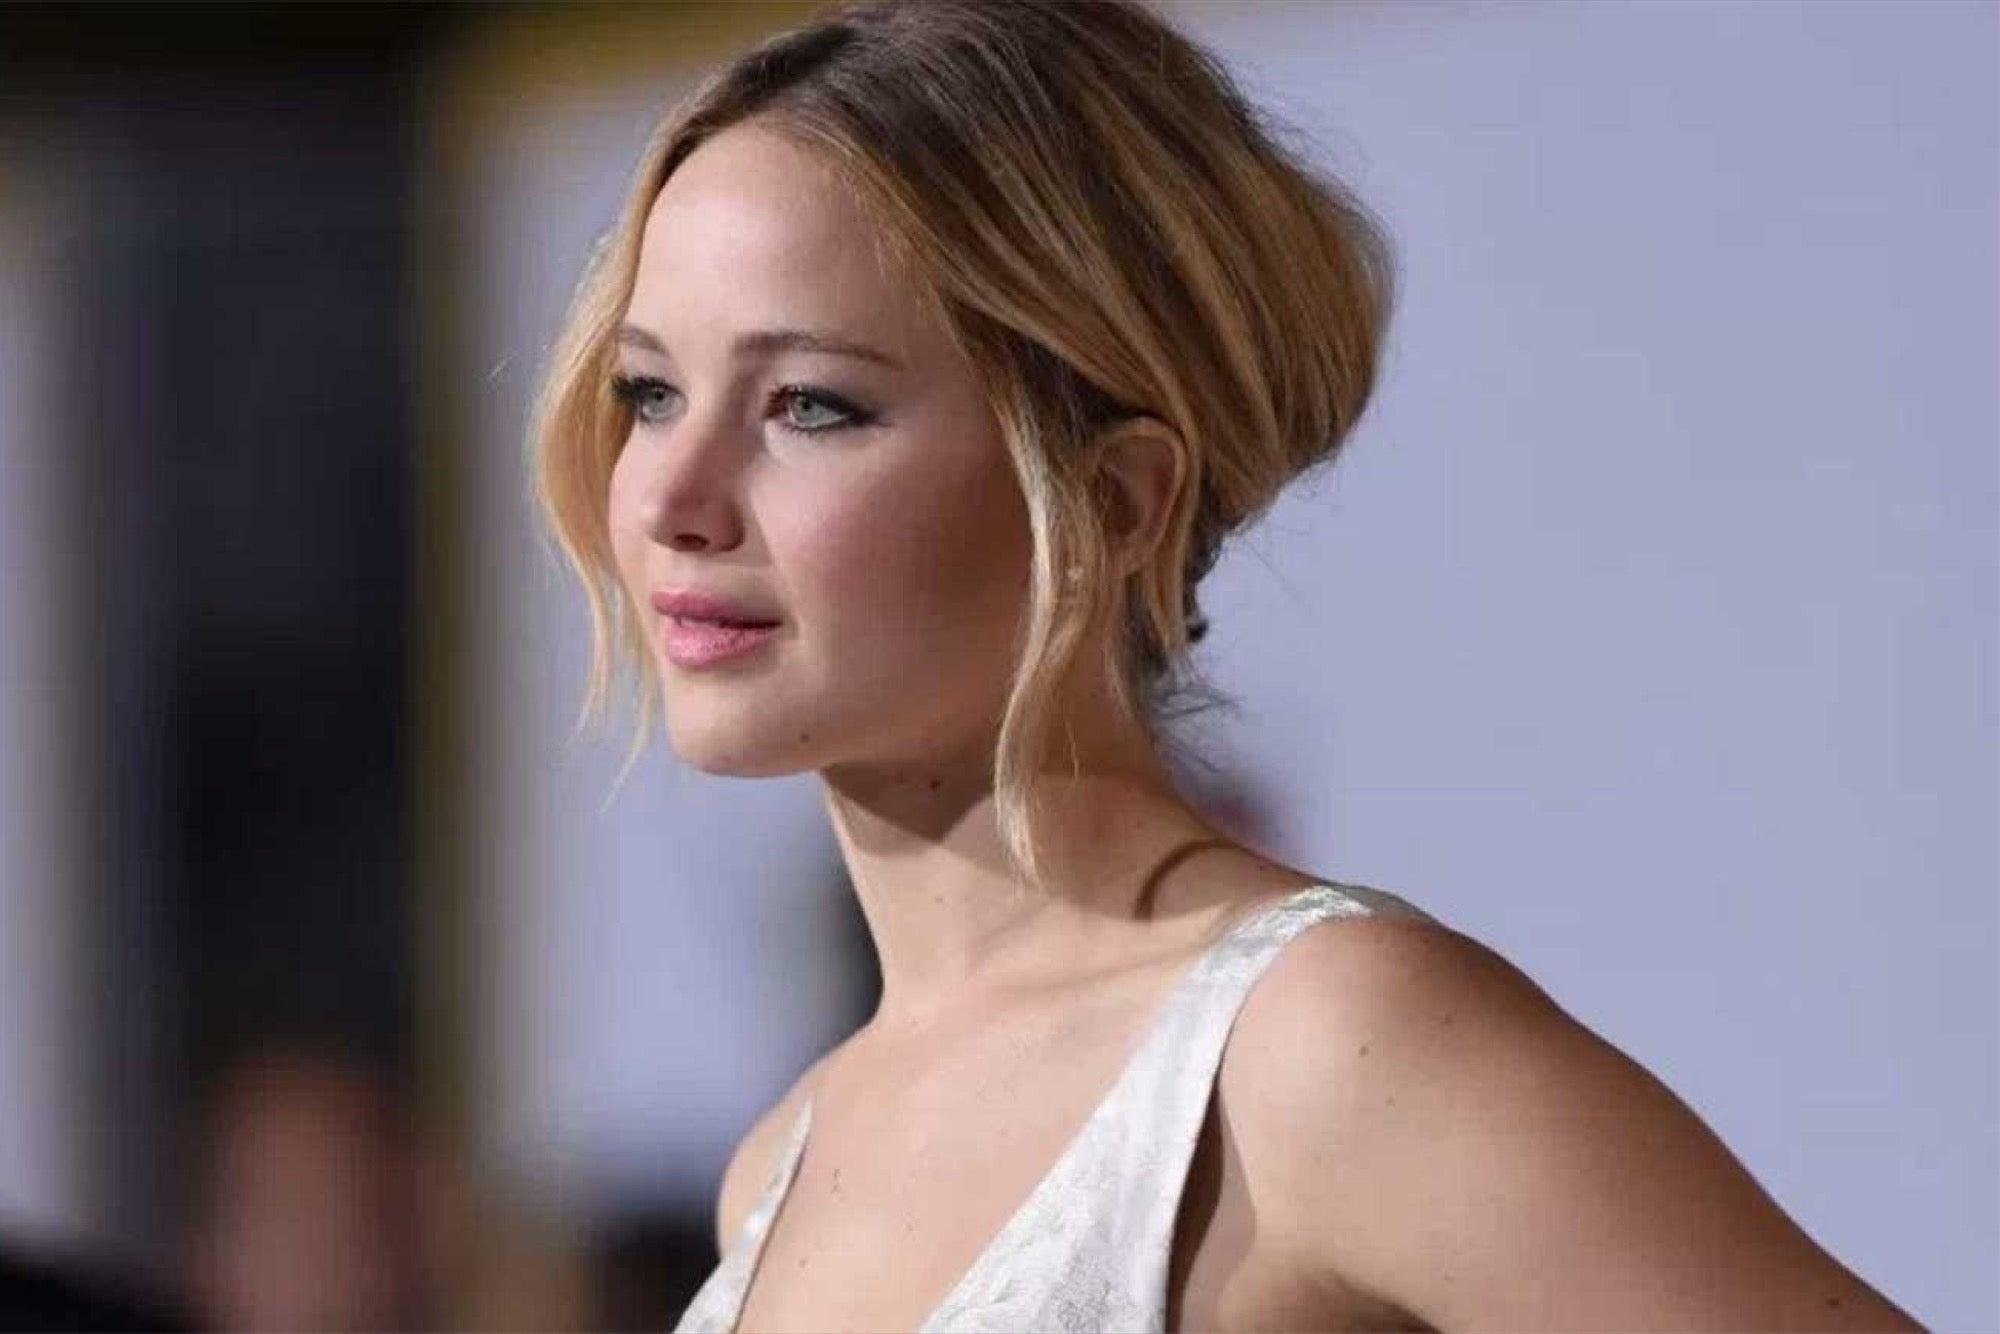 Nudeselfie jennifer lawrence Exclusive: Jennifer